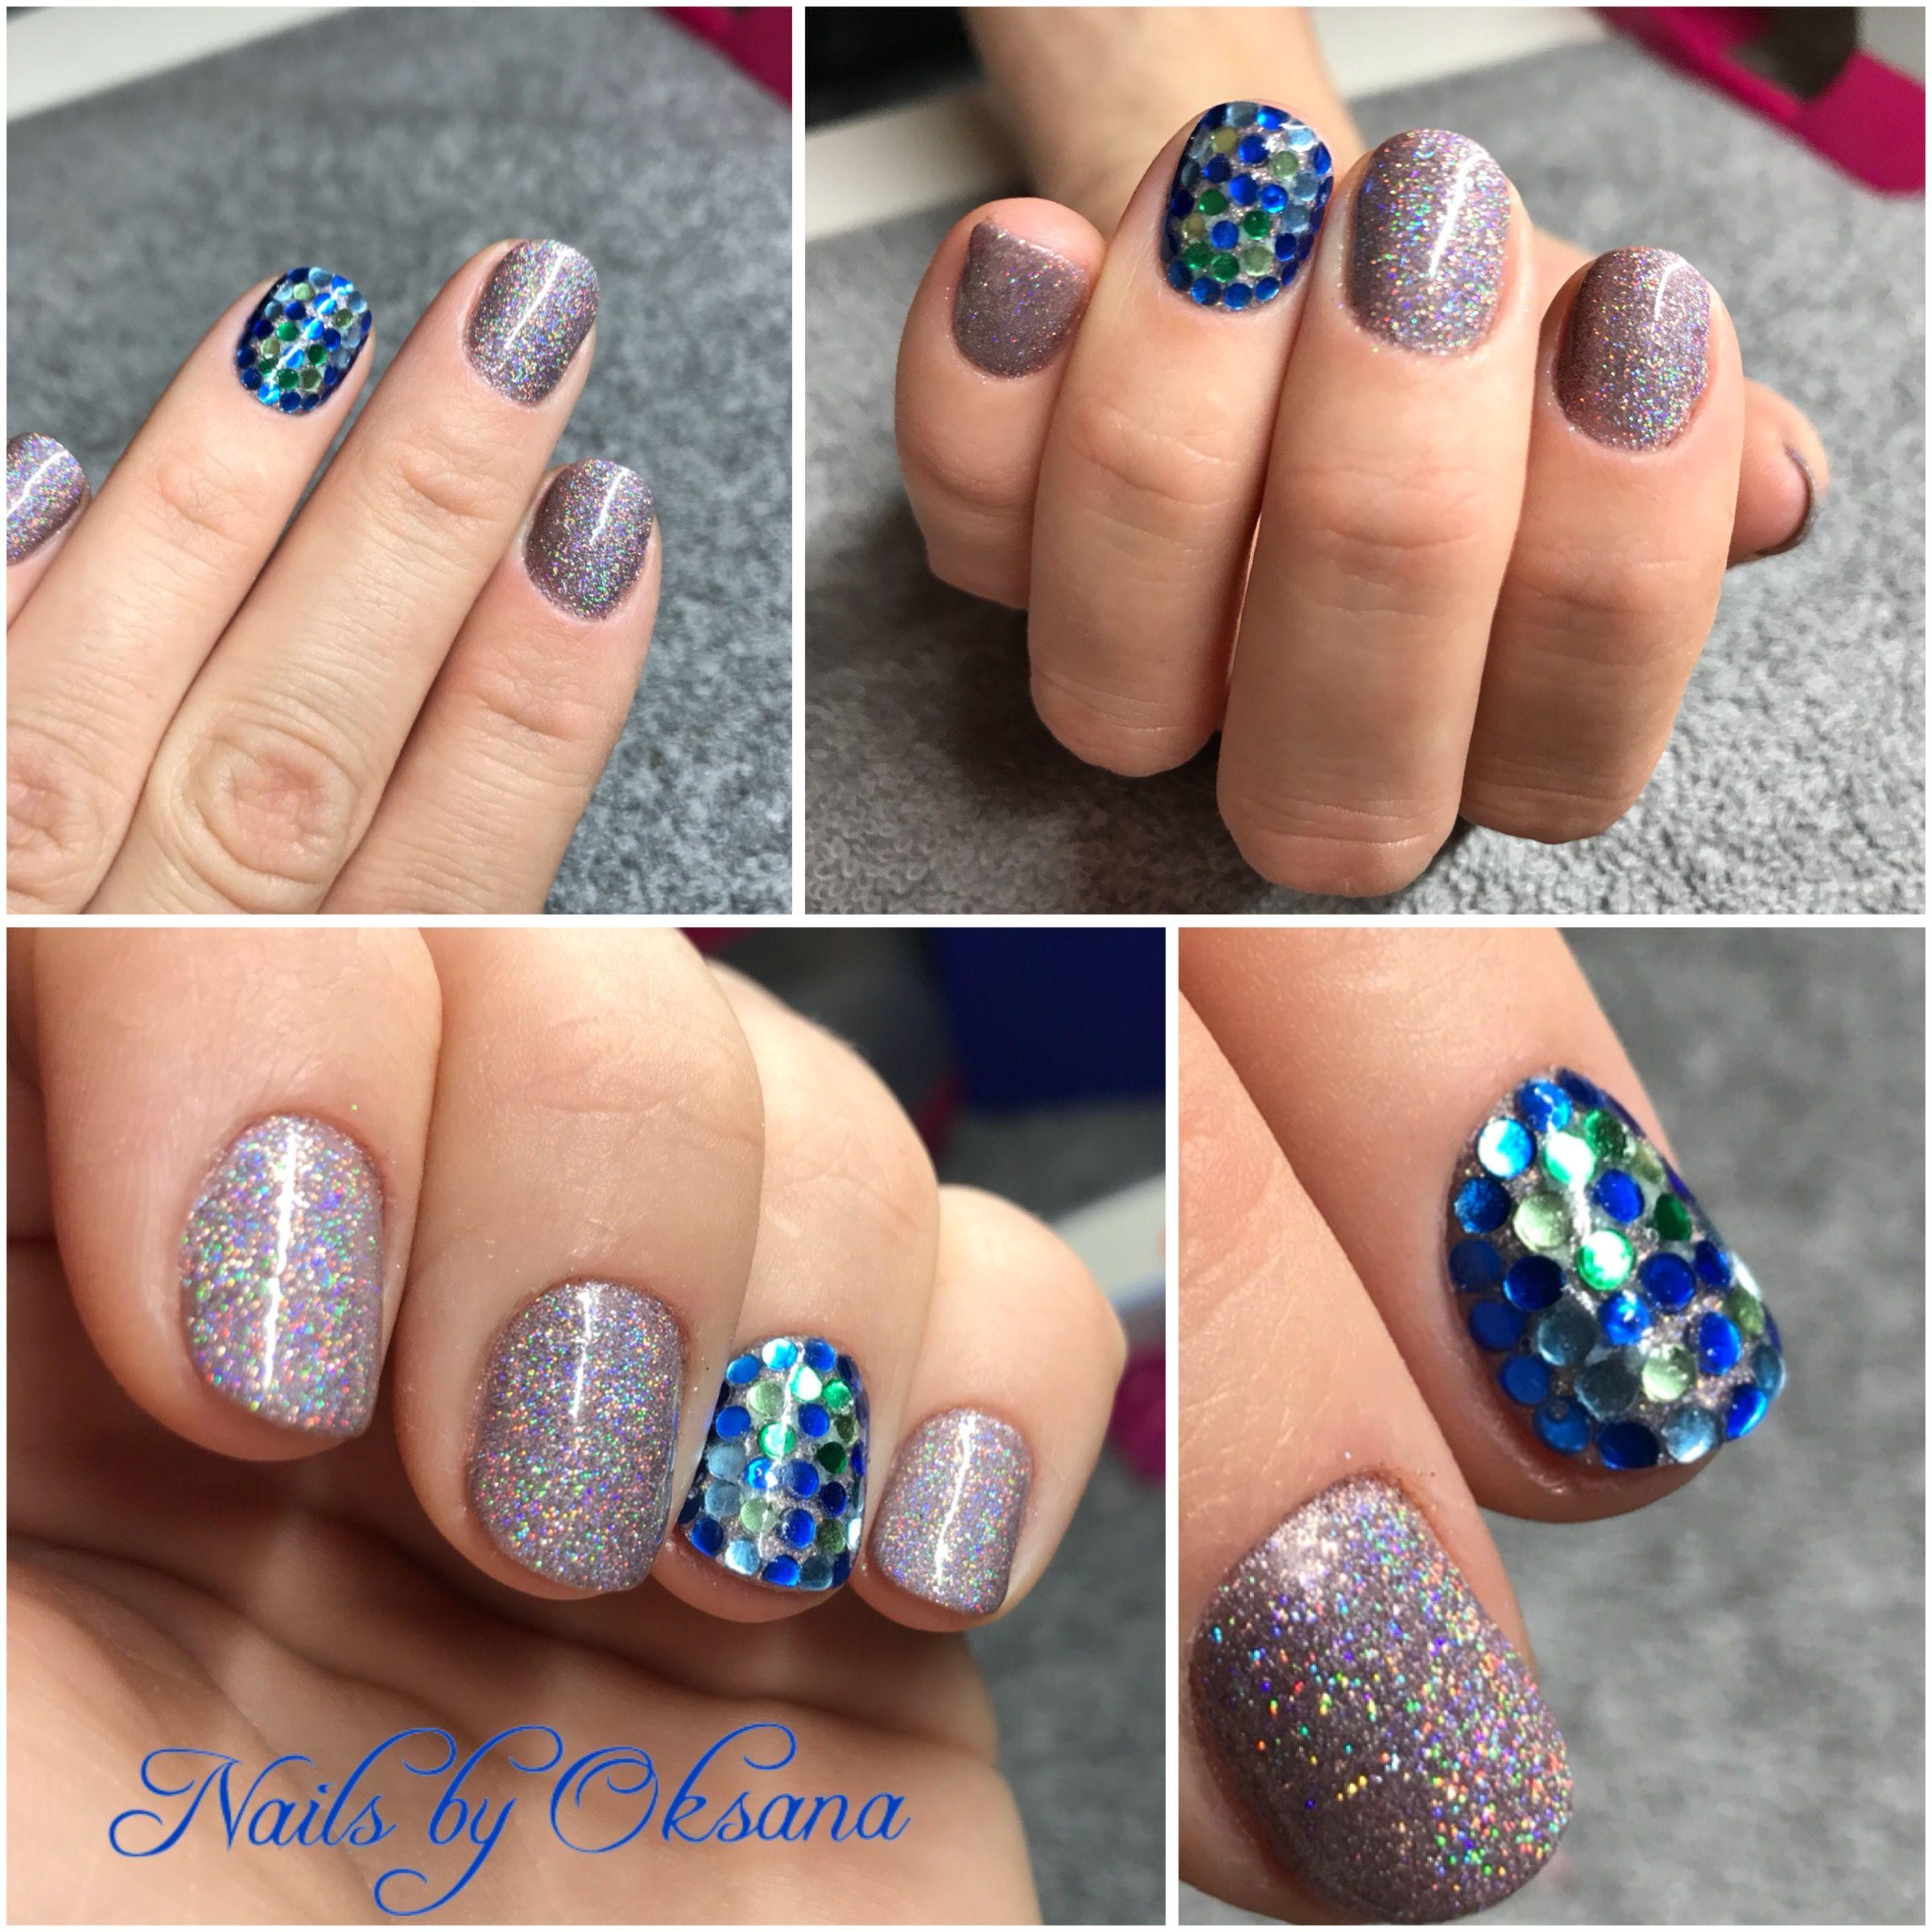 Gelish Manicure Plus Holographic Powder And Mosaic Nail Design